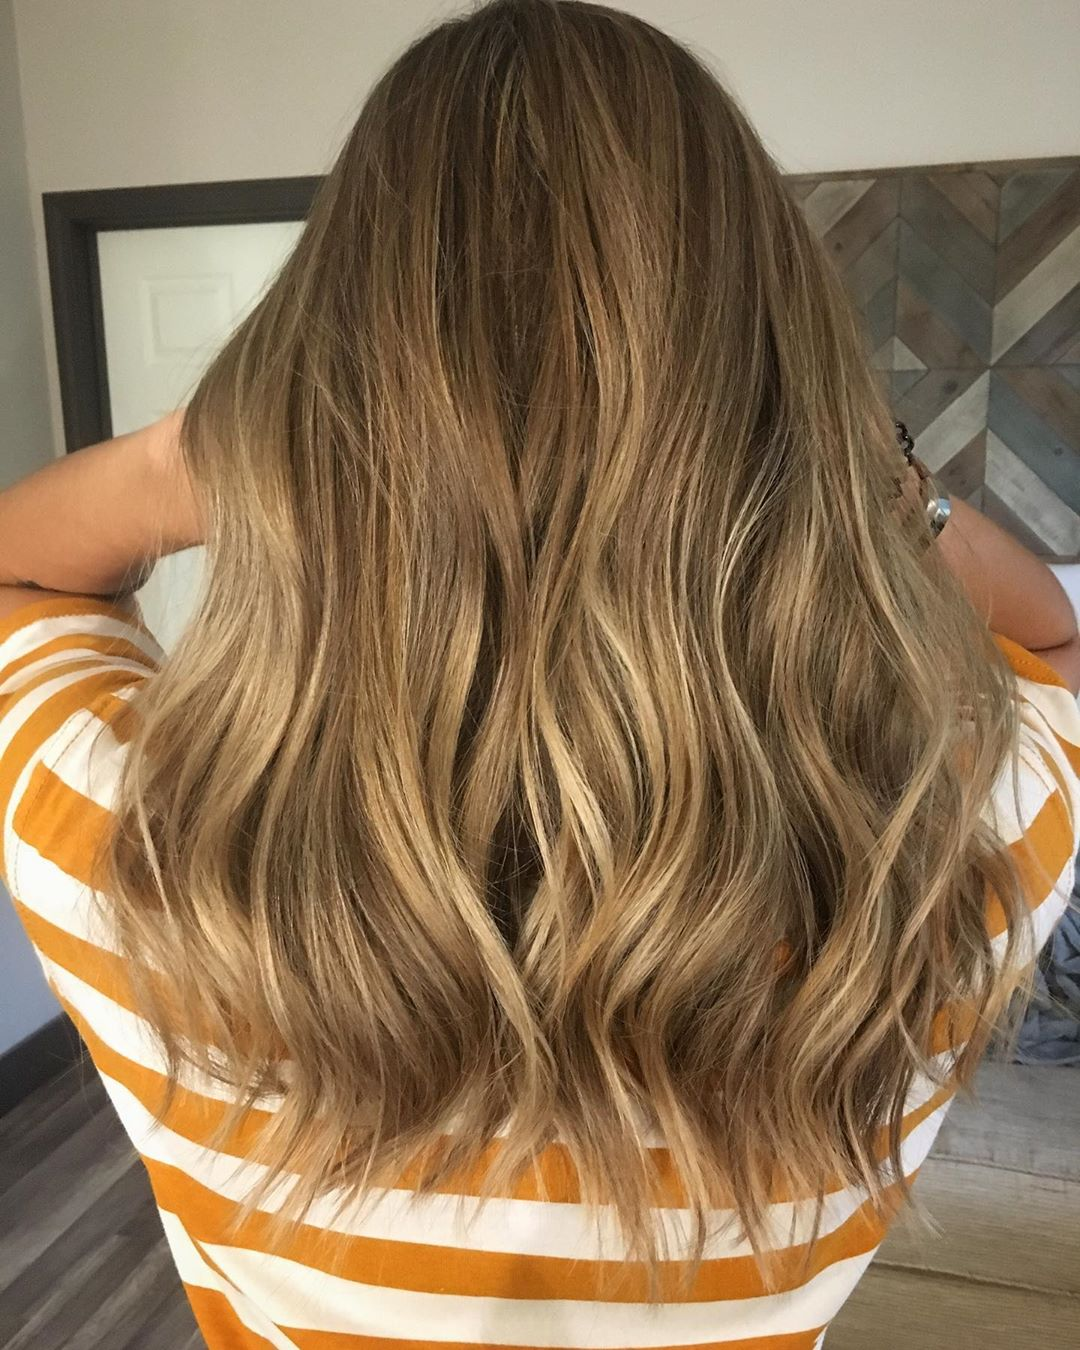 harmony hairstyles by liana 66025302 2231715360274043 2896331520031467568 n